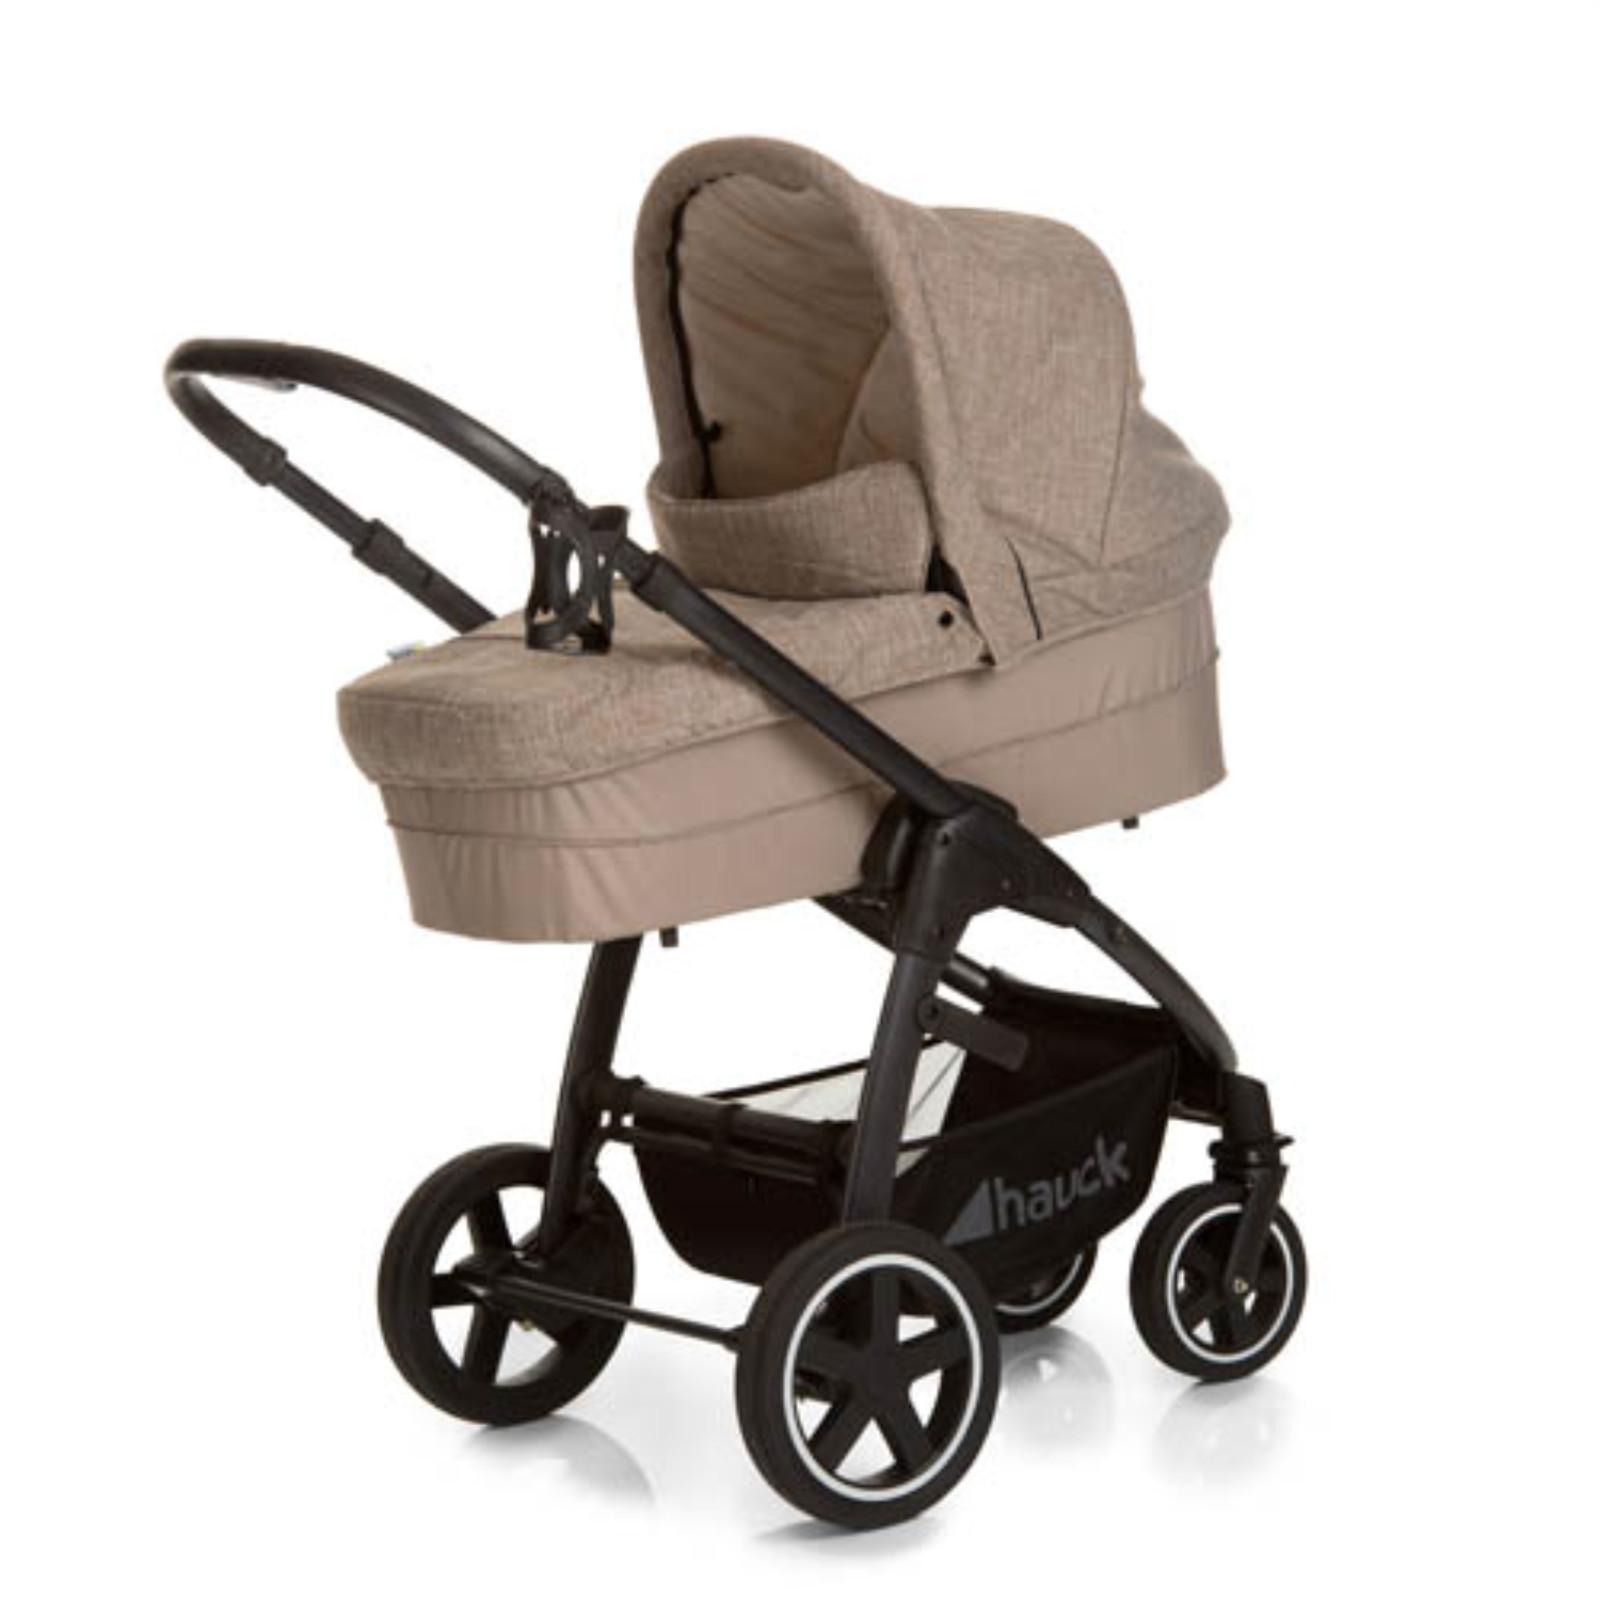 hauck melange sand soul plus trio set travel system pushchair carrycot car seat ebay. Black Bedroom Furniture Sets. Home Design Ideas